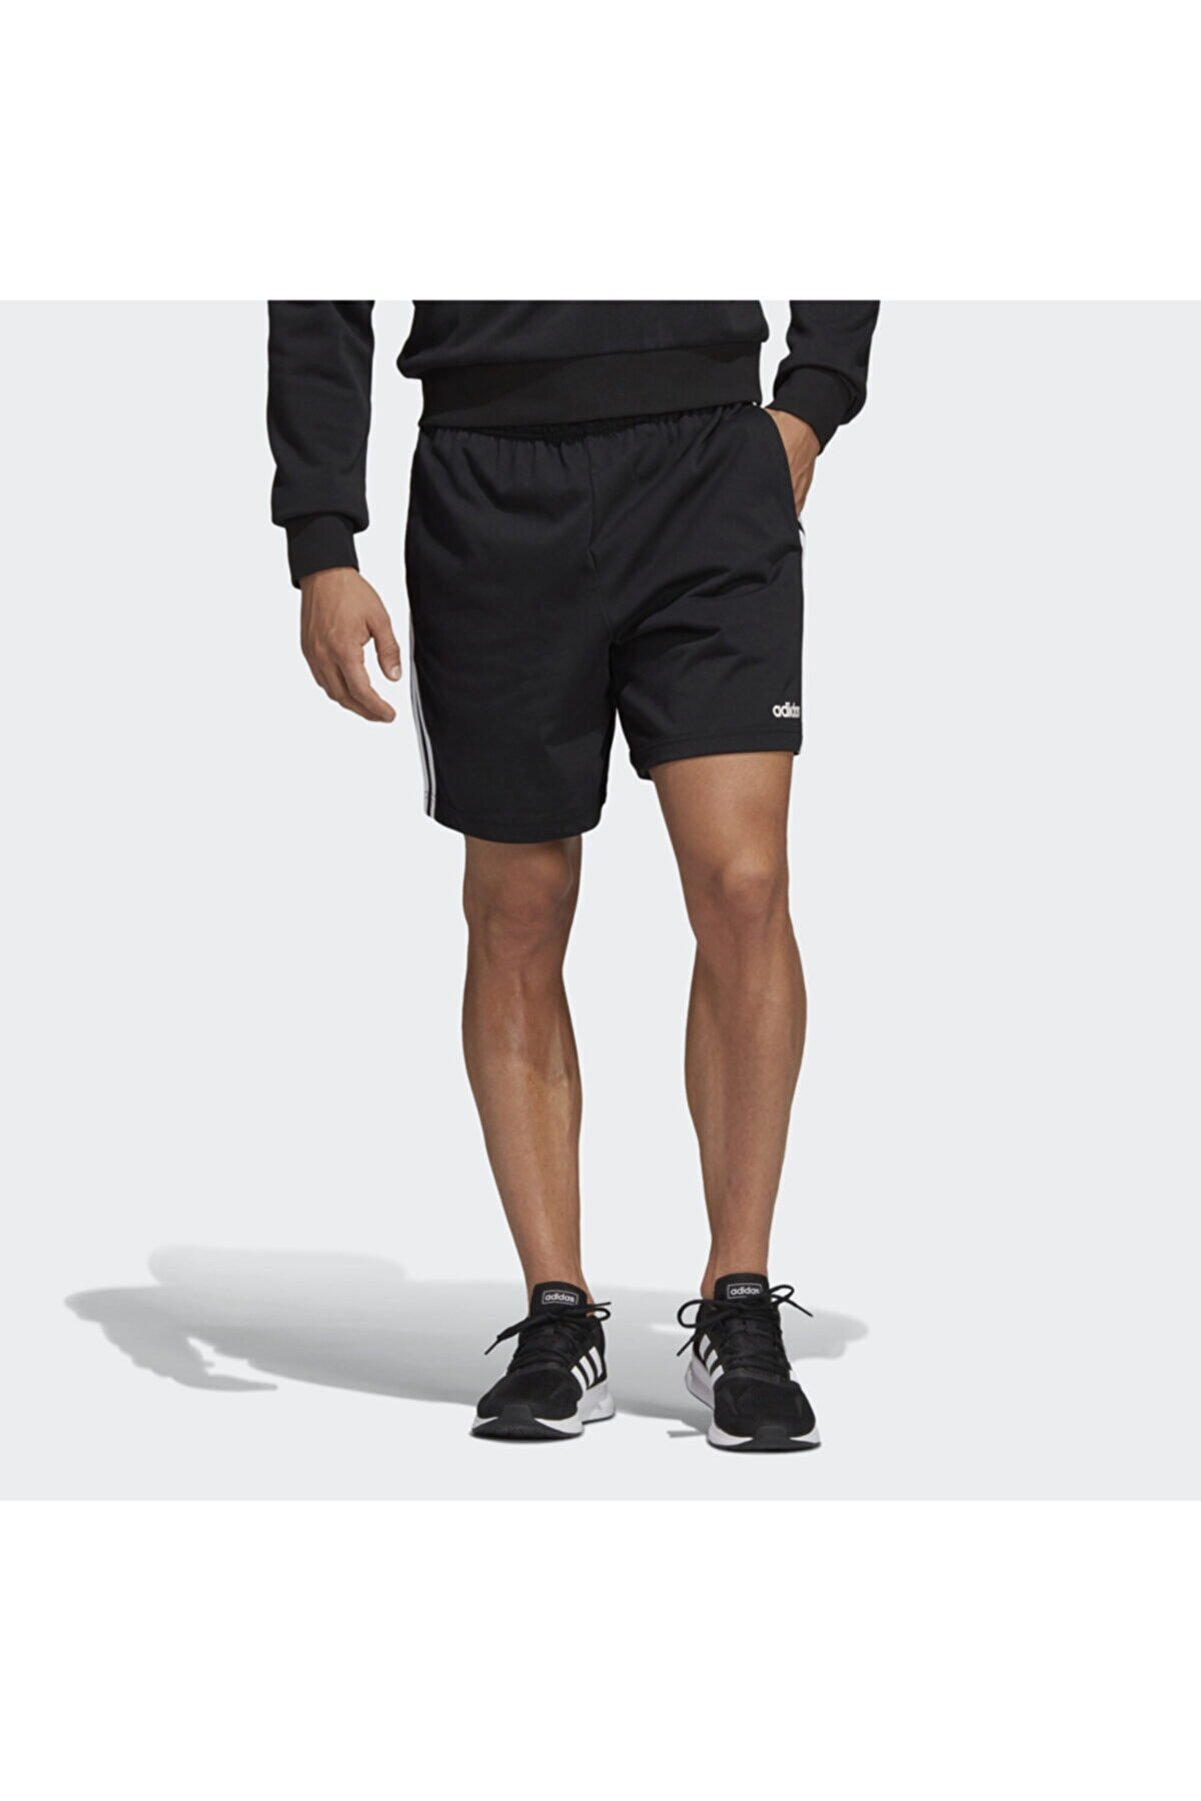 adidas E 3S SHRT SJ 1, Siyah Erkek Uzun Şort 100547693